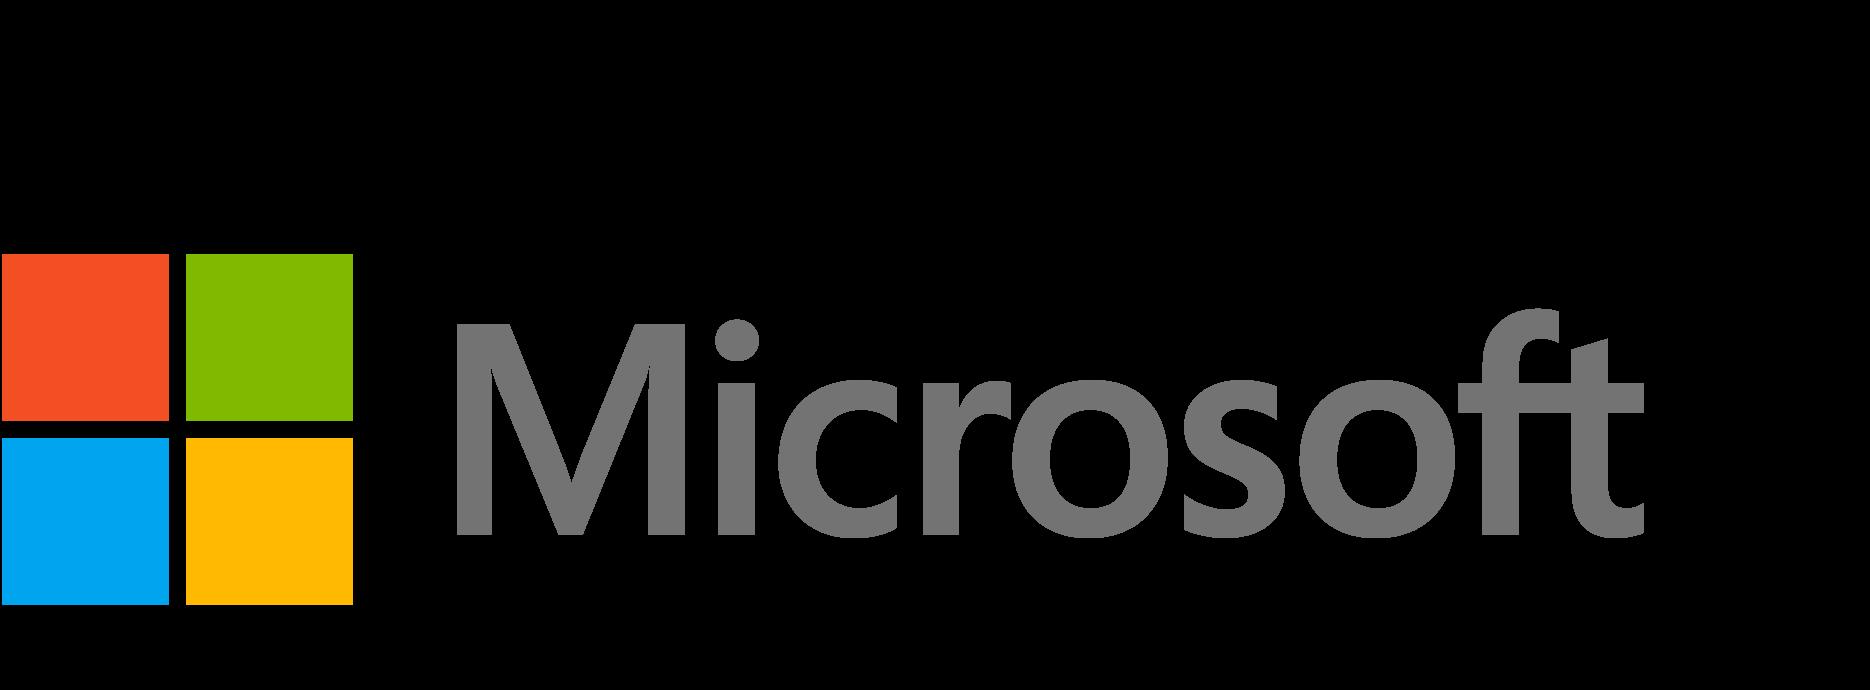 microsoft-logo-png-transparent-20